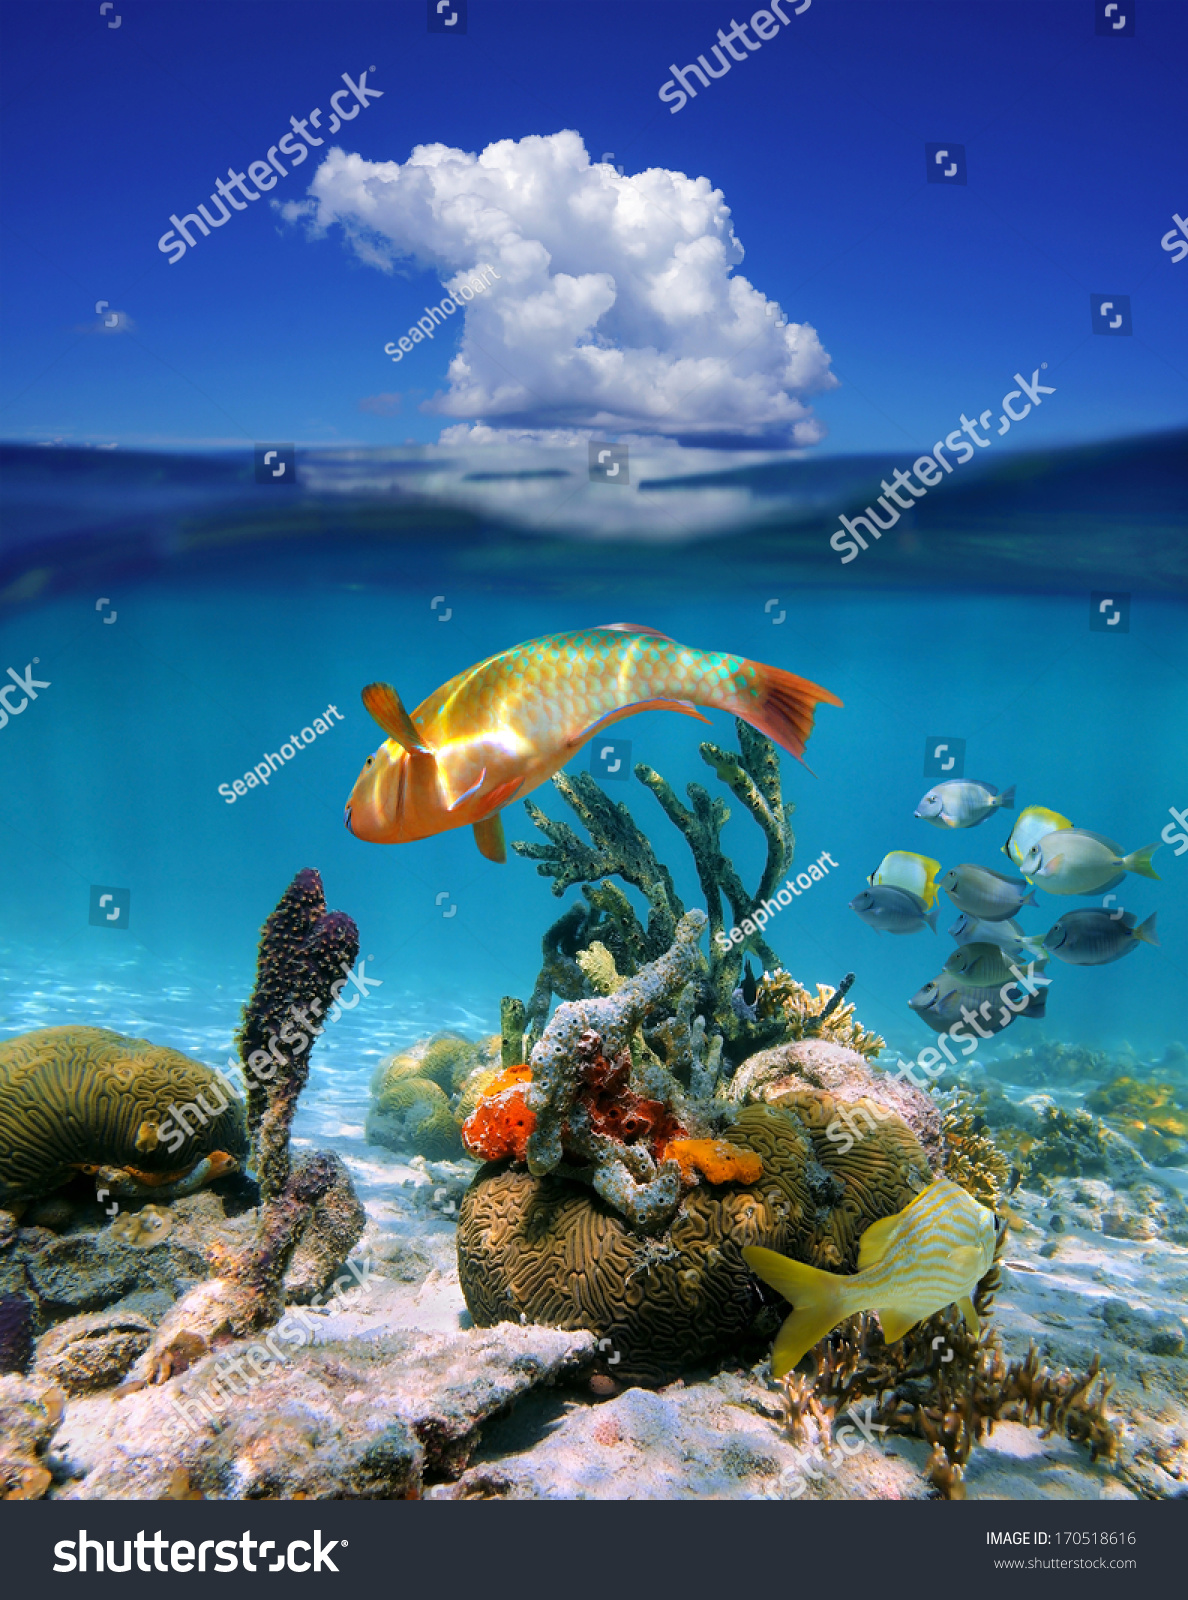 40 Brilliant Photographs of Undersea Life - DesignM.ag |Colorful Underwater Life